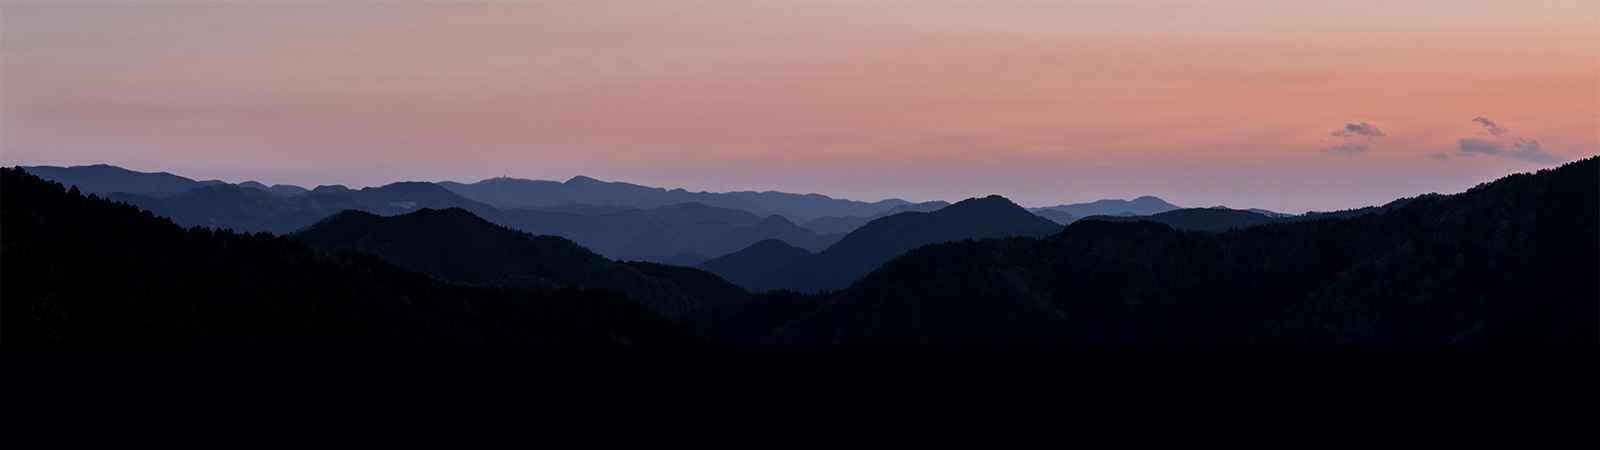 Ancient pilgrimage trail twinned with Camino de Santiago